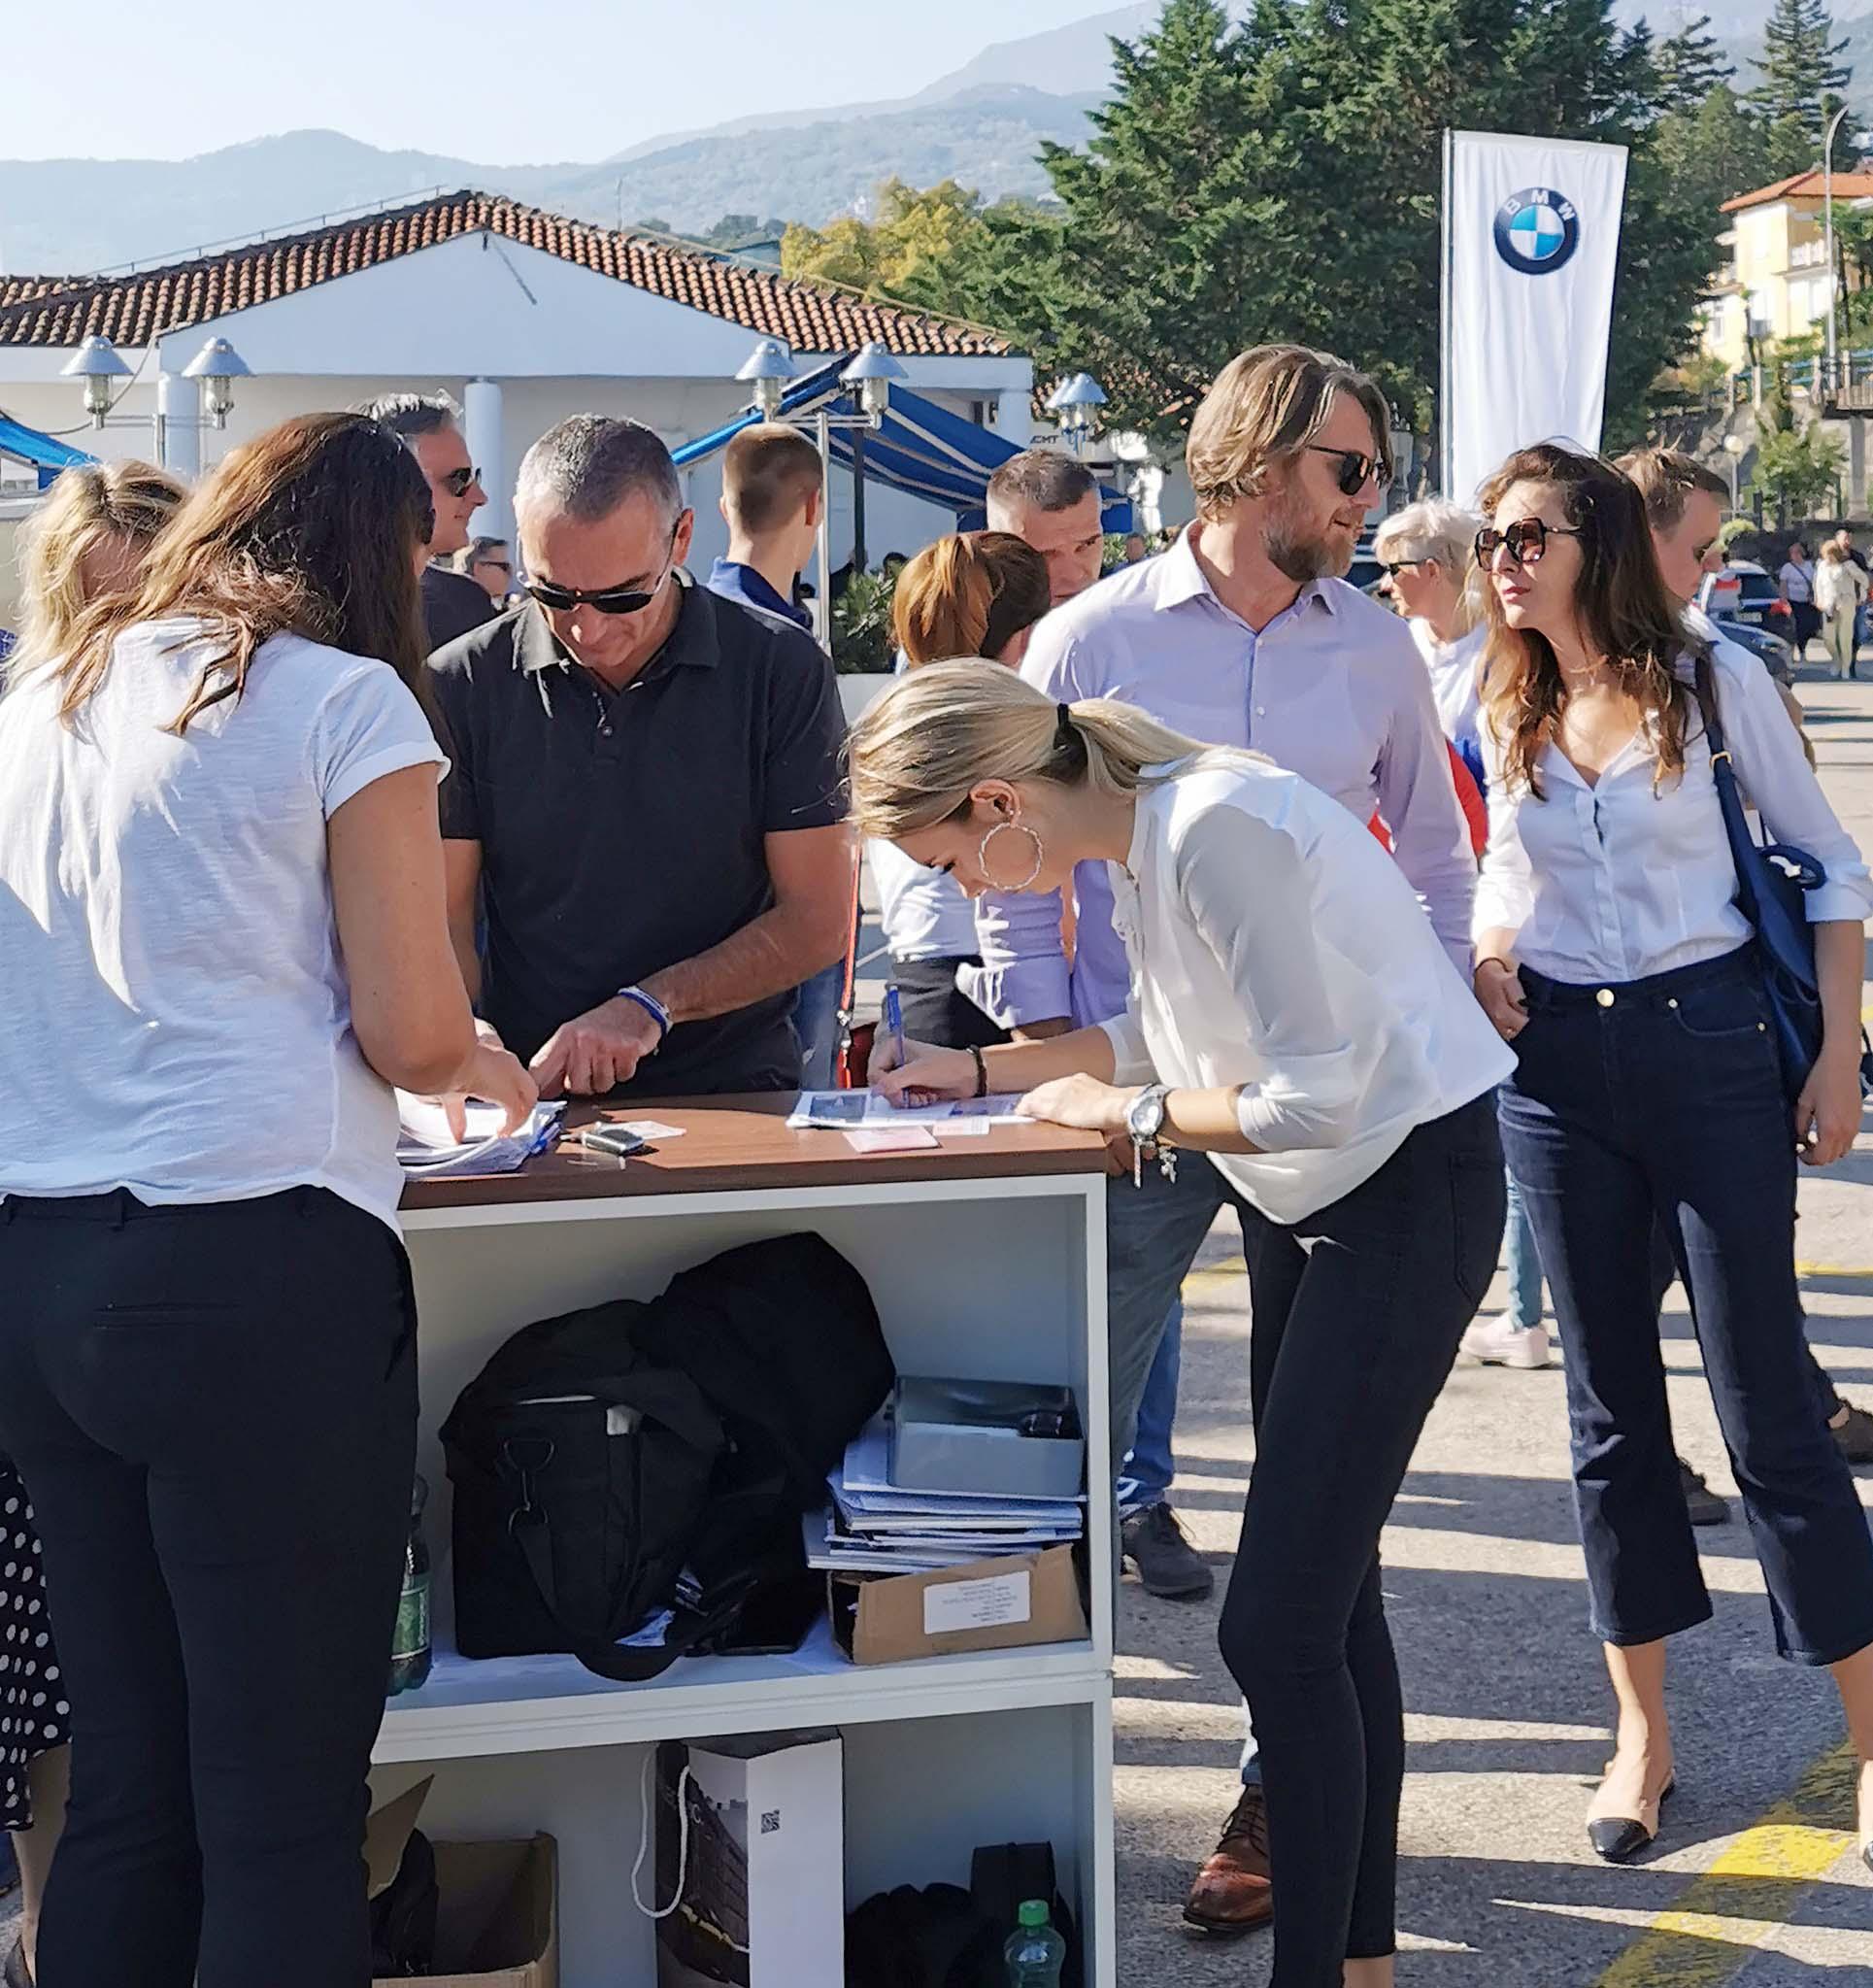 BMW Roadshow u ACI marini Opatija / Snimi Ivica TOMIĆ